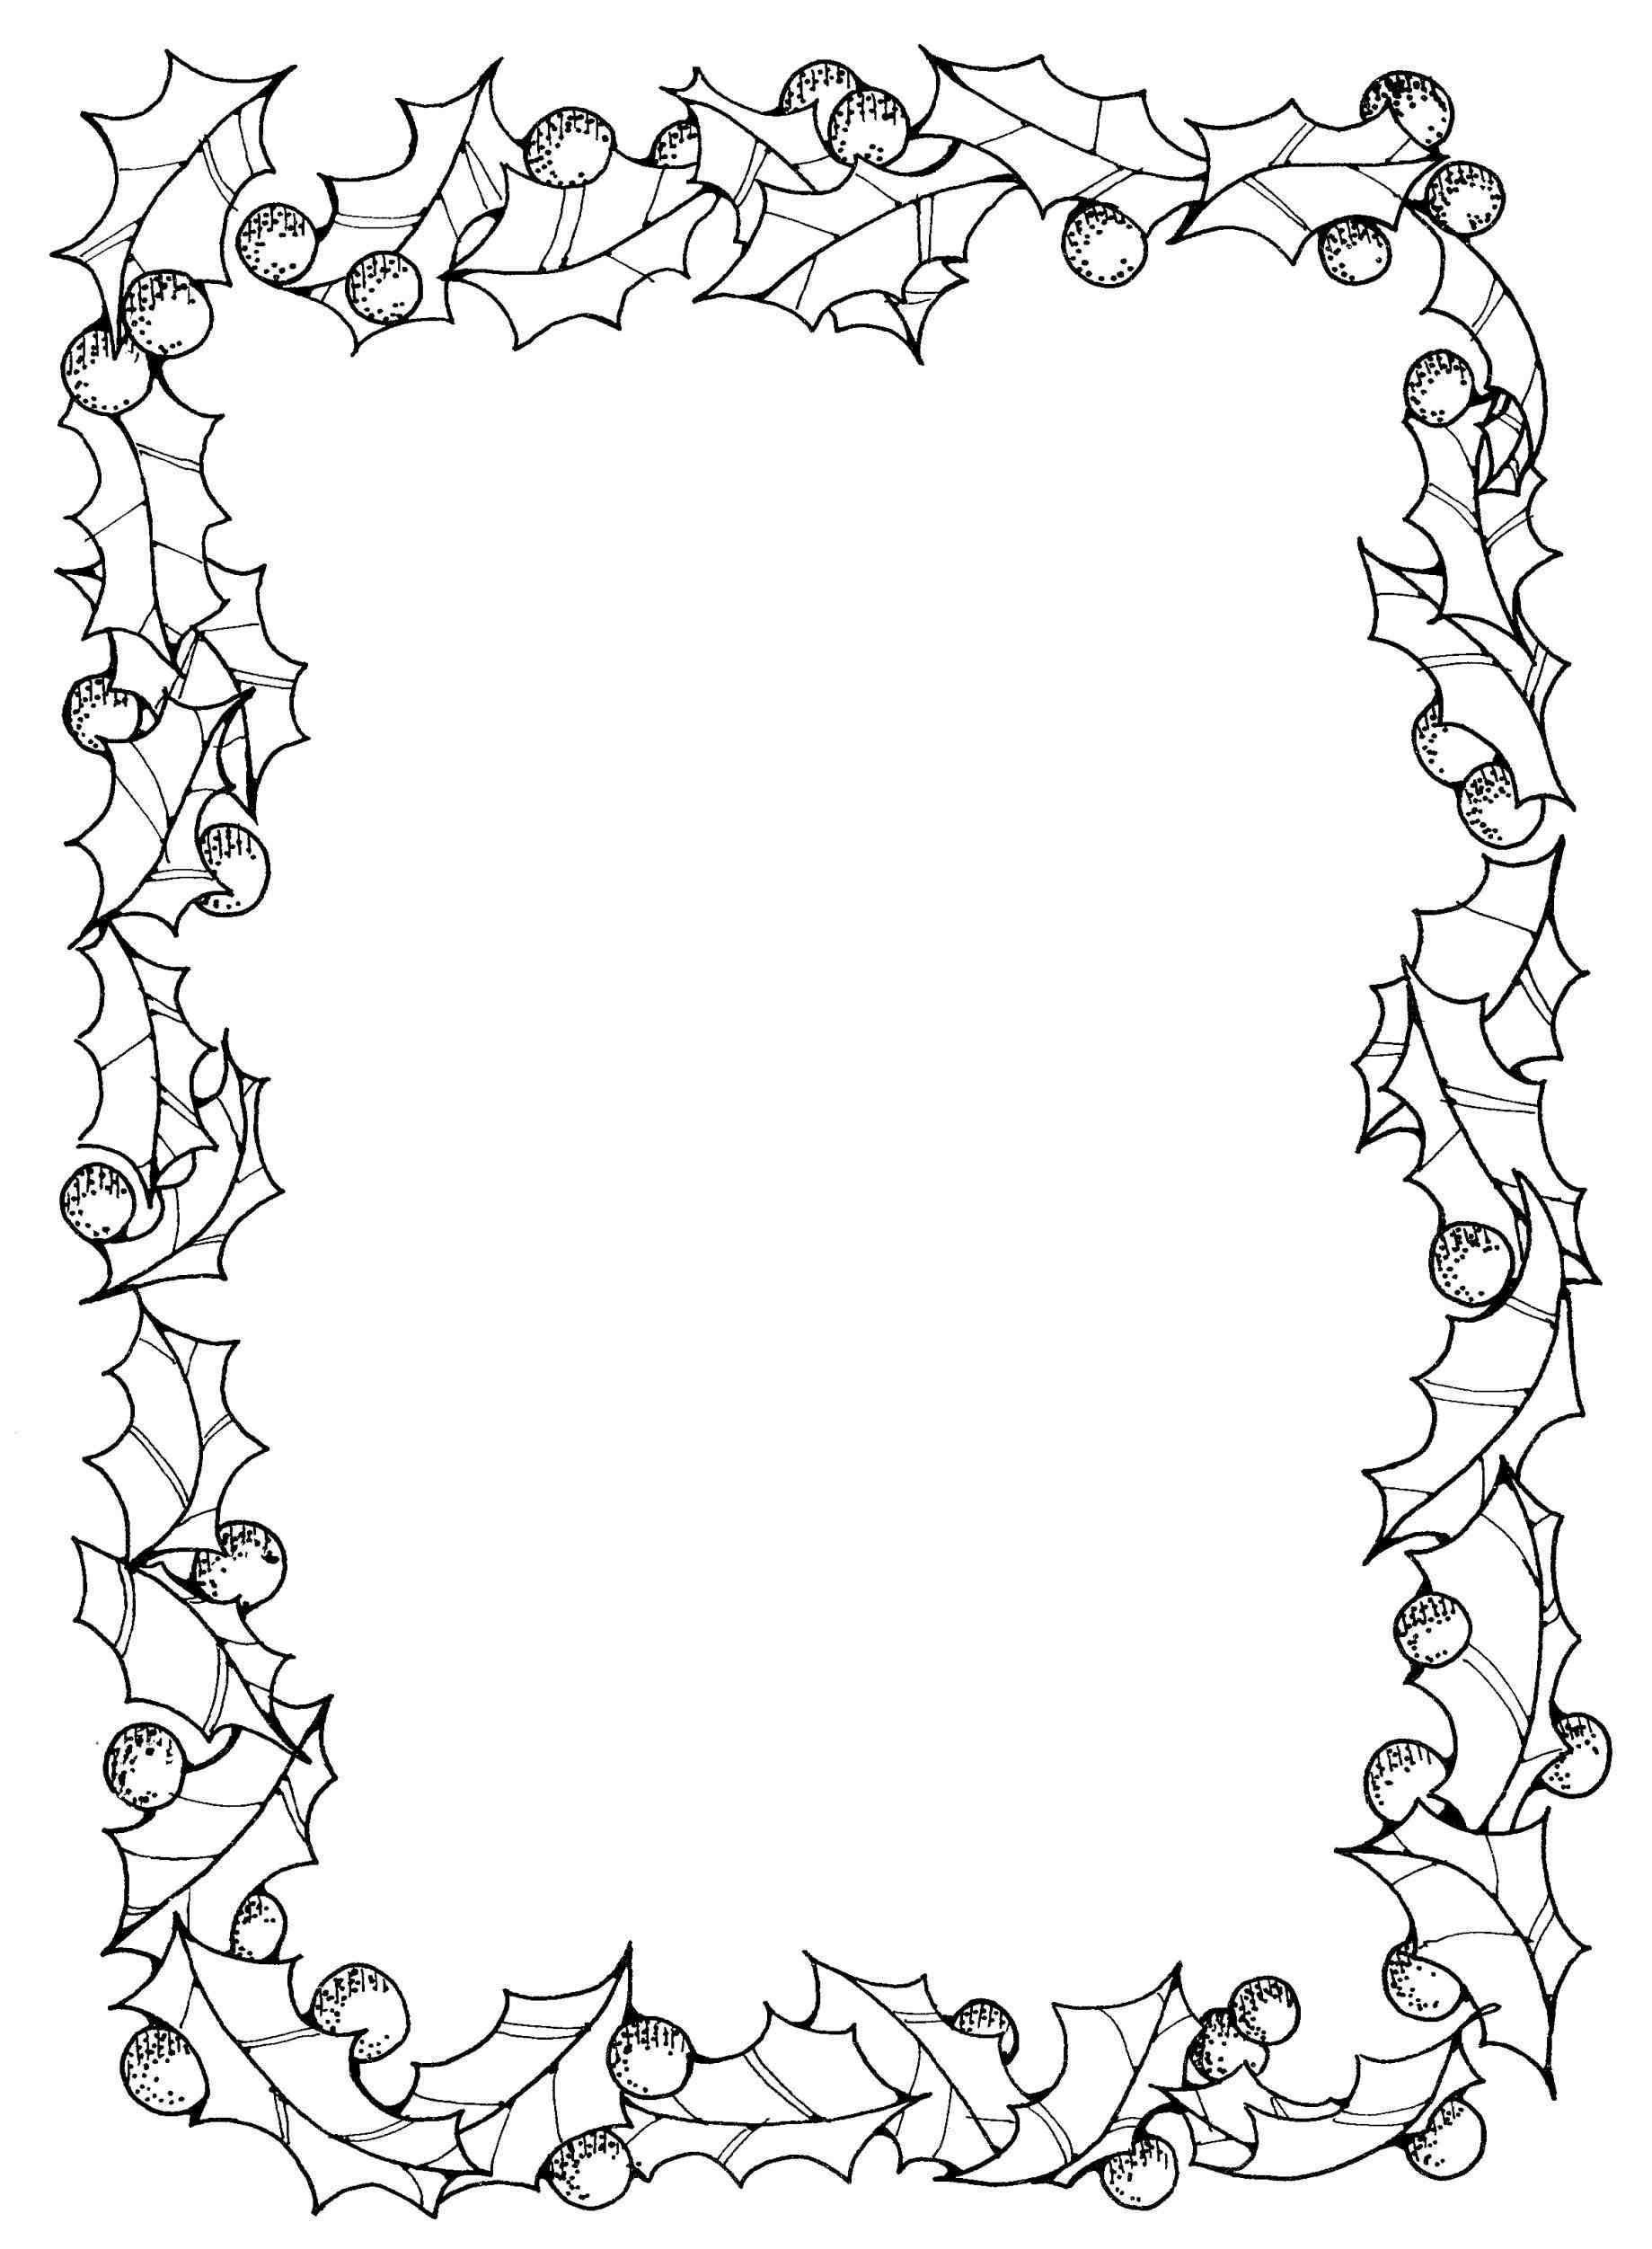 New Christmas Page Borders Black And White At Temasistemi